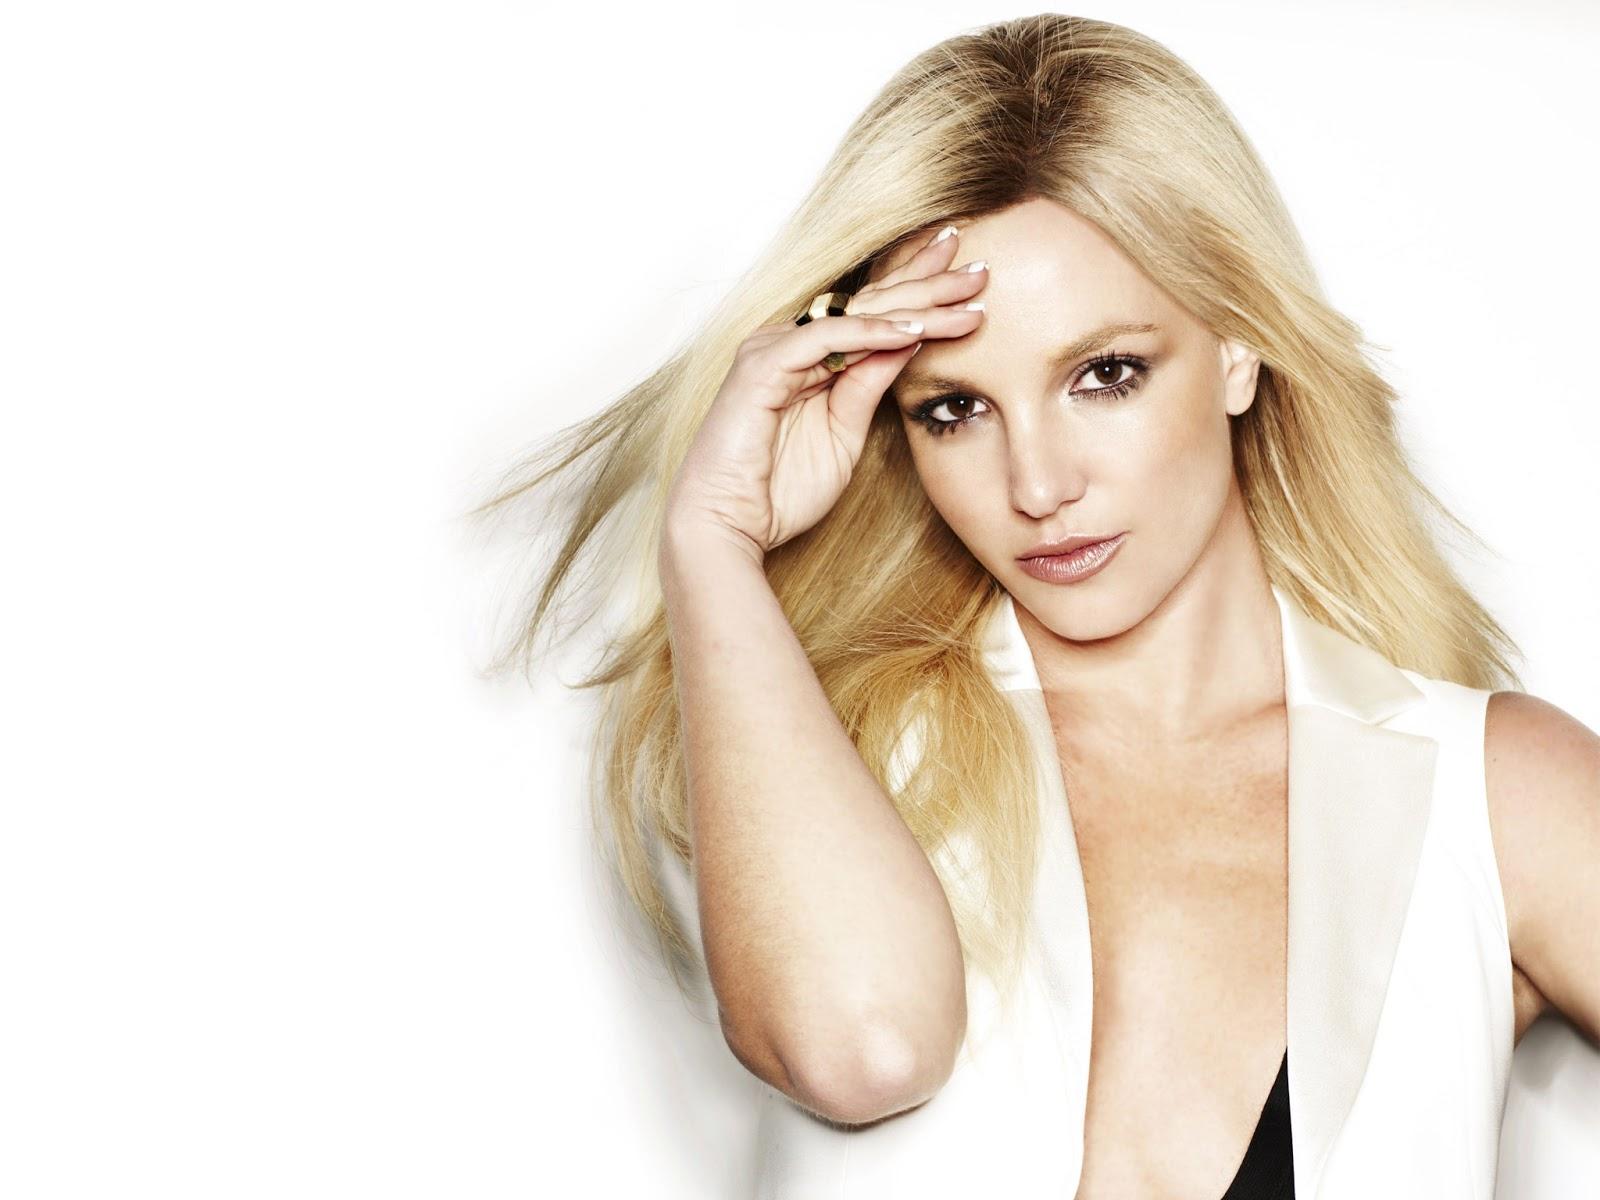 britney spears britney spears britney spears britney spears britney ... Britney Spears